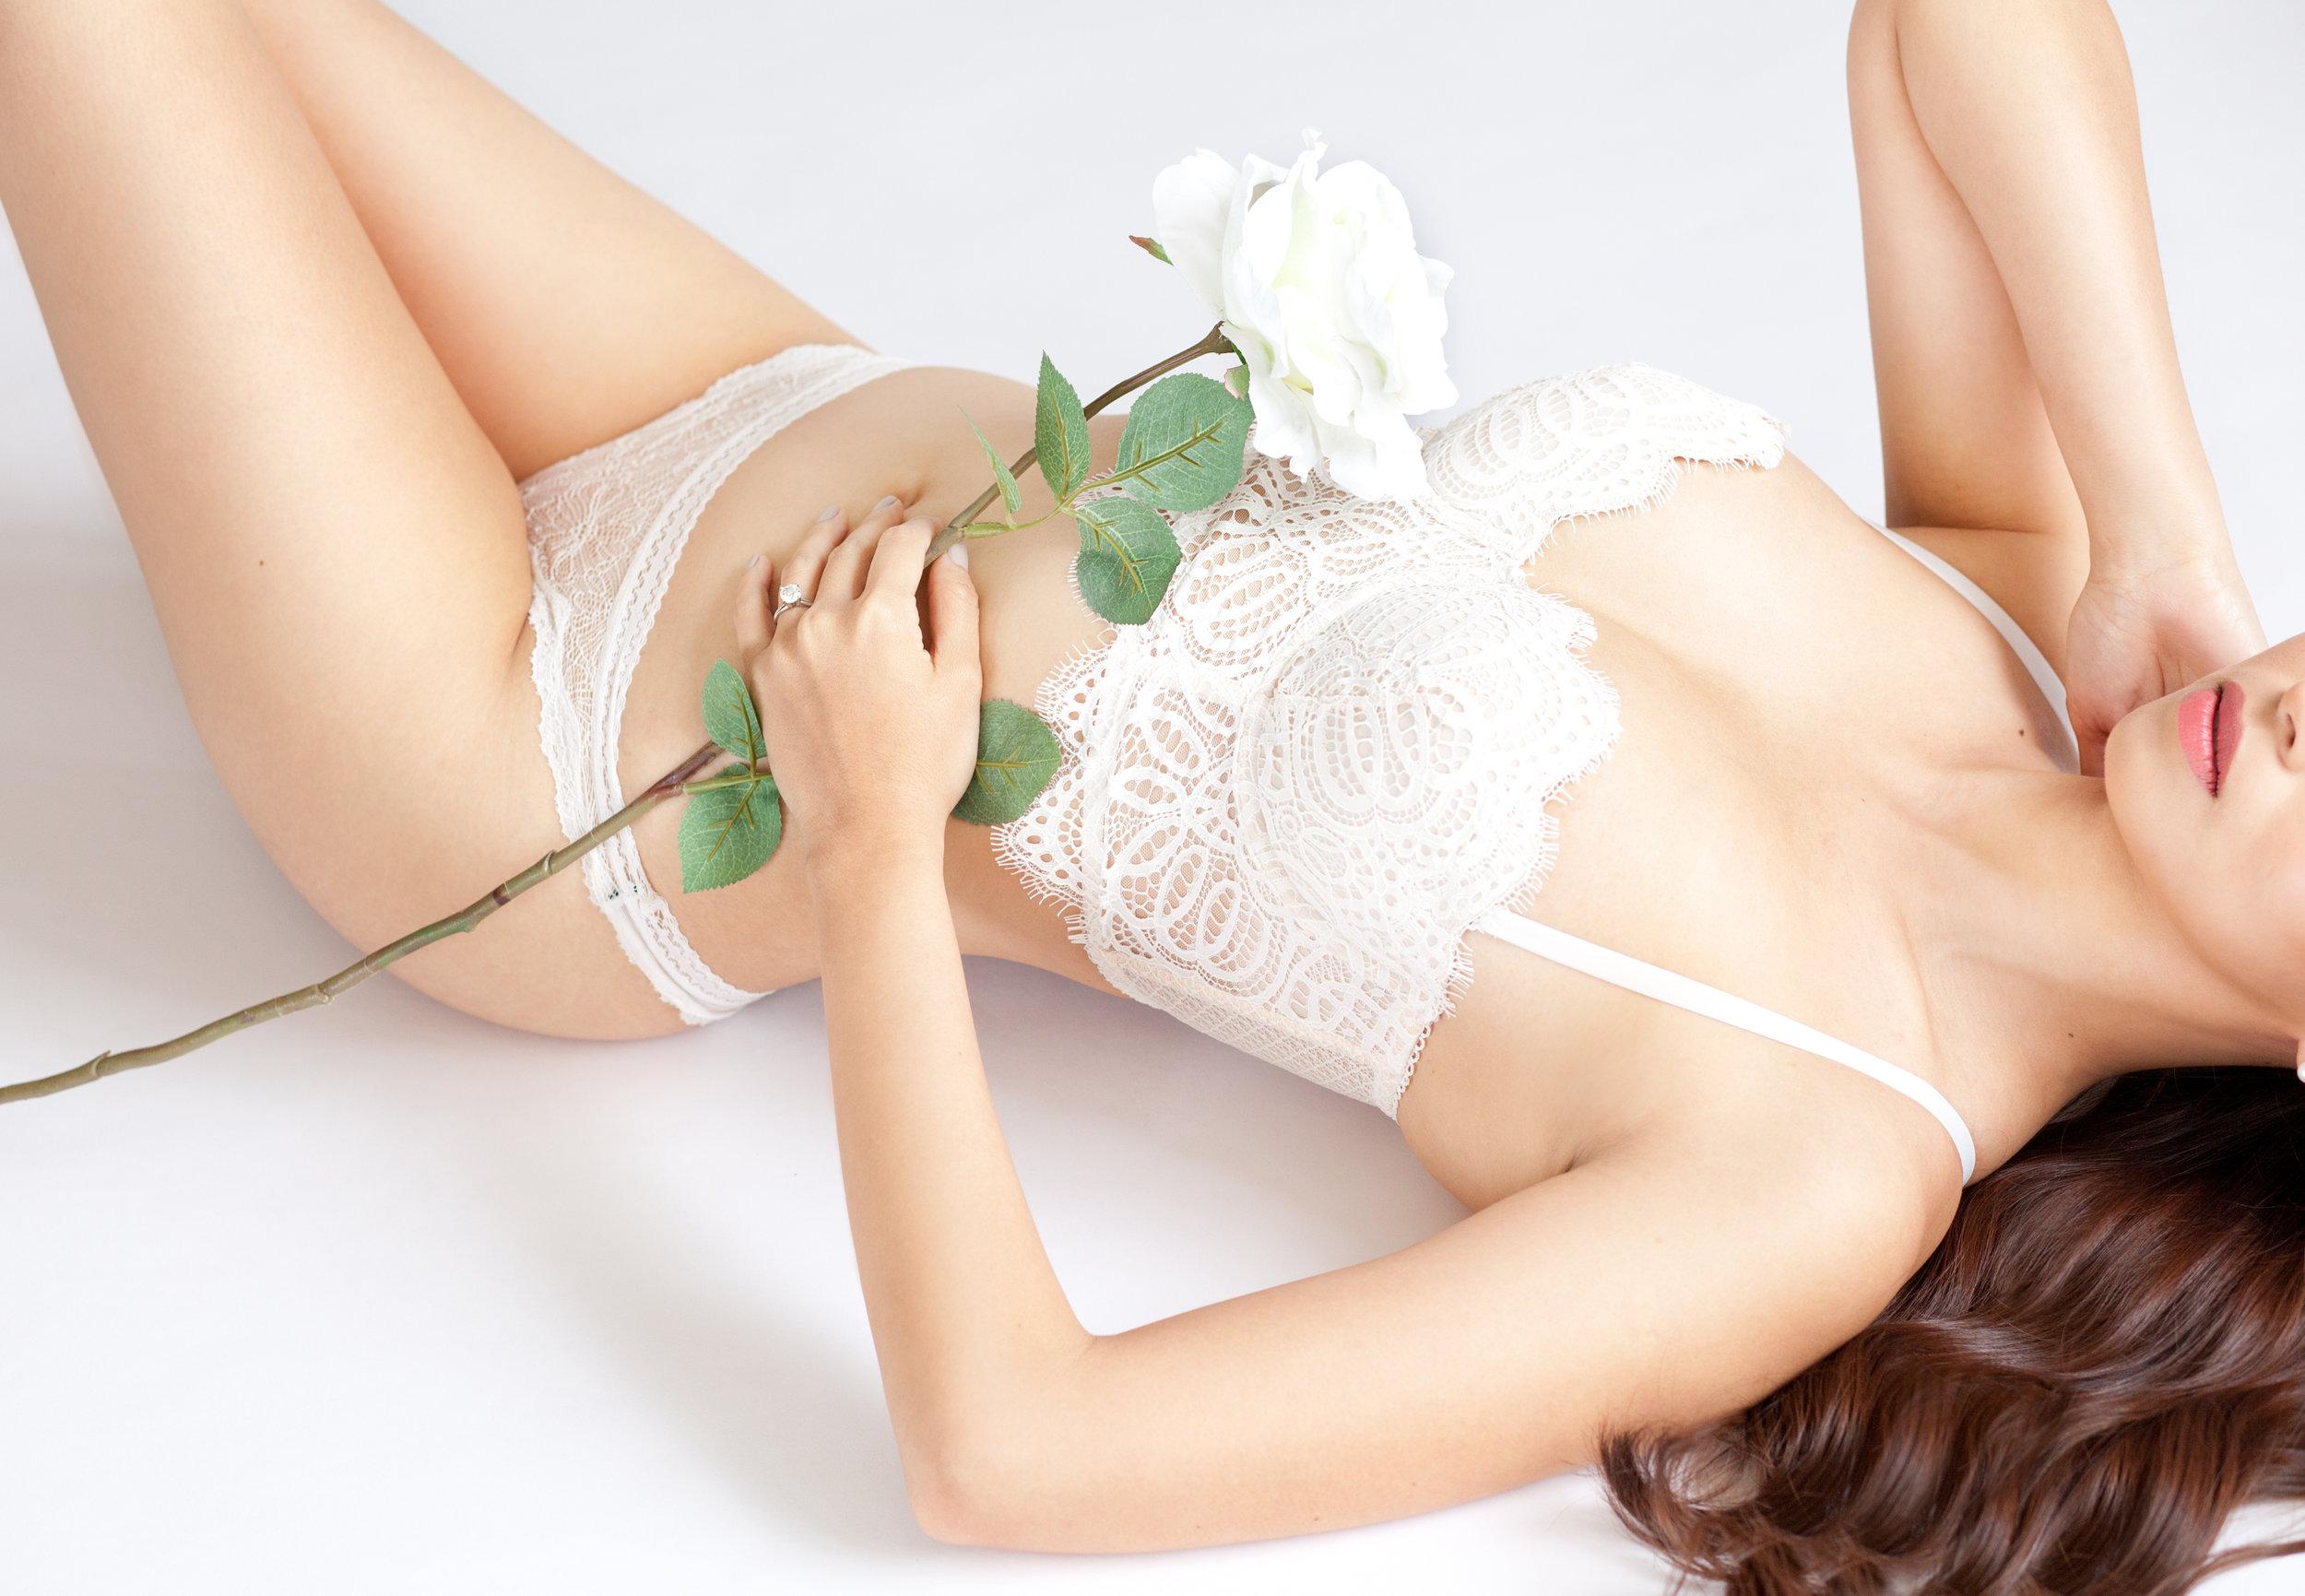 Stephanie-HighRes-CareyLynne-10.jpg